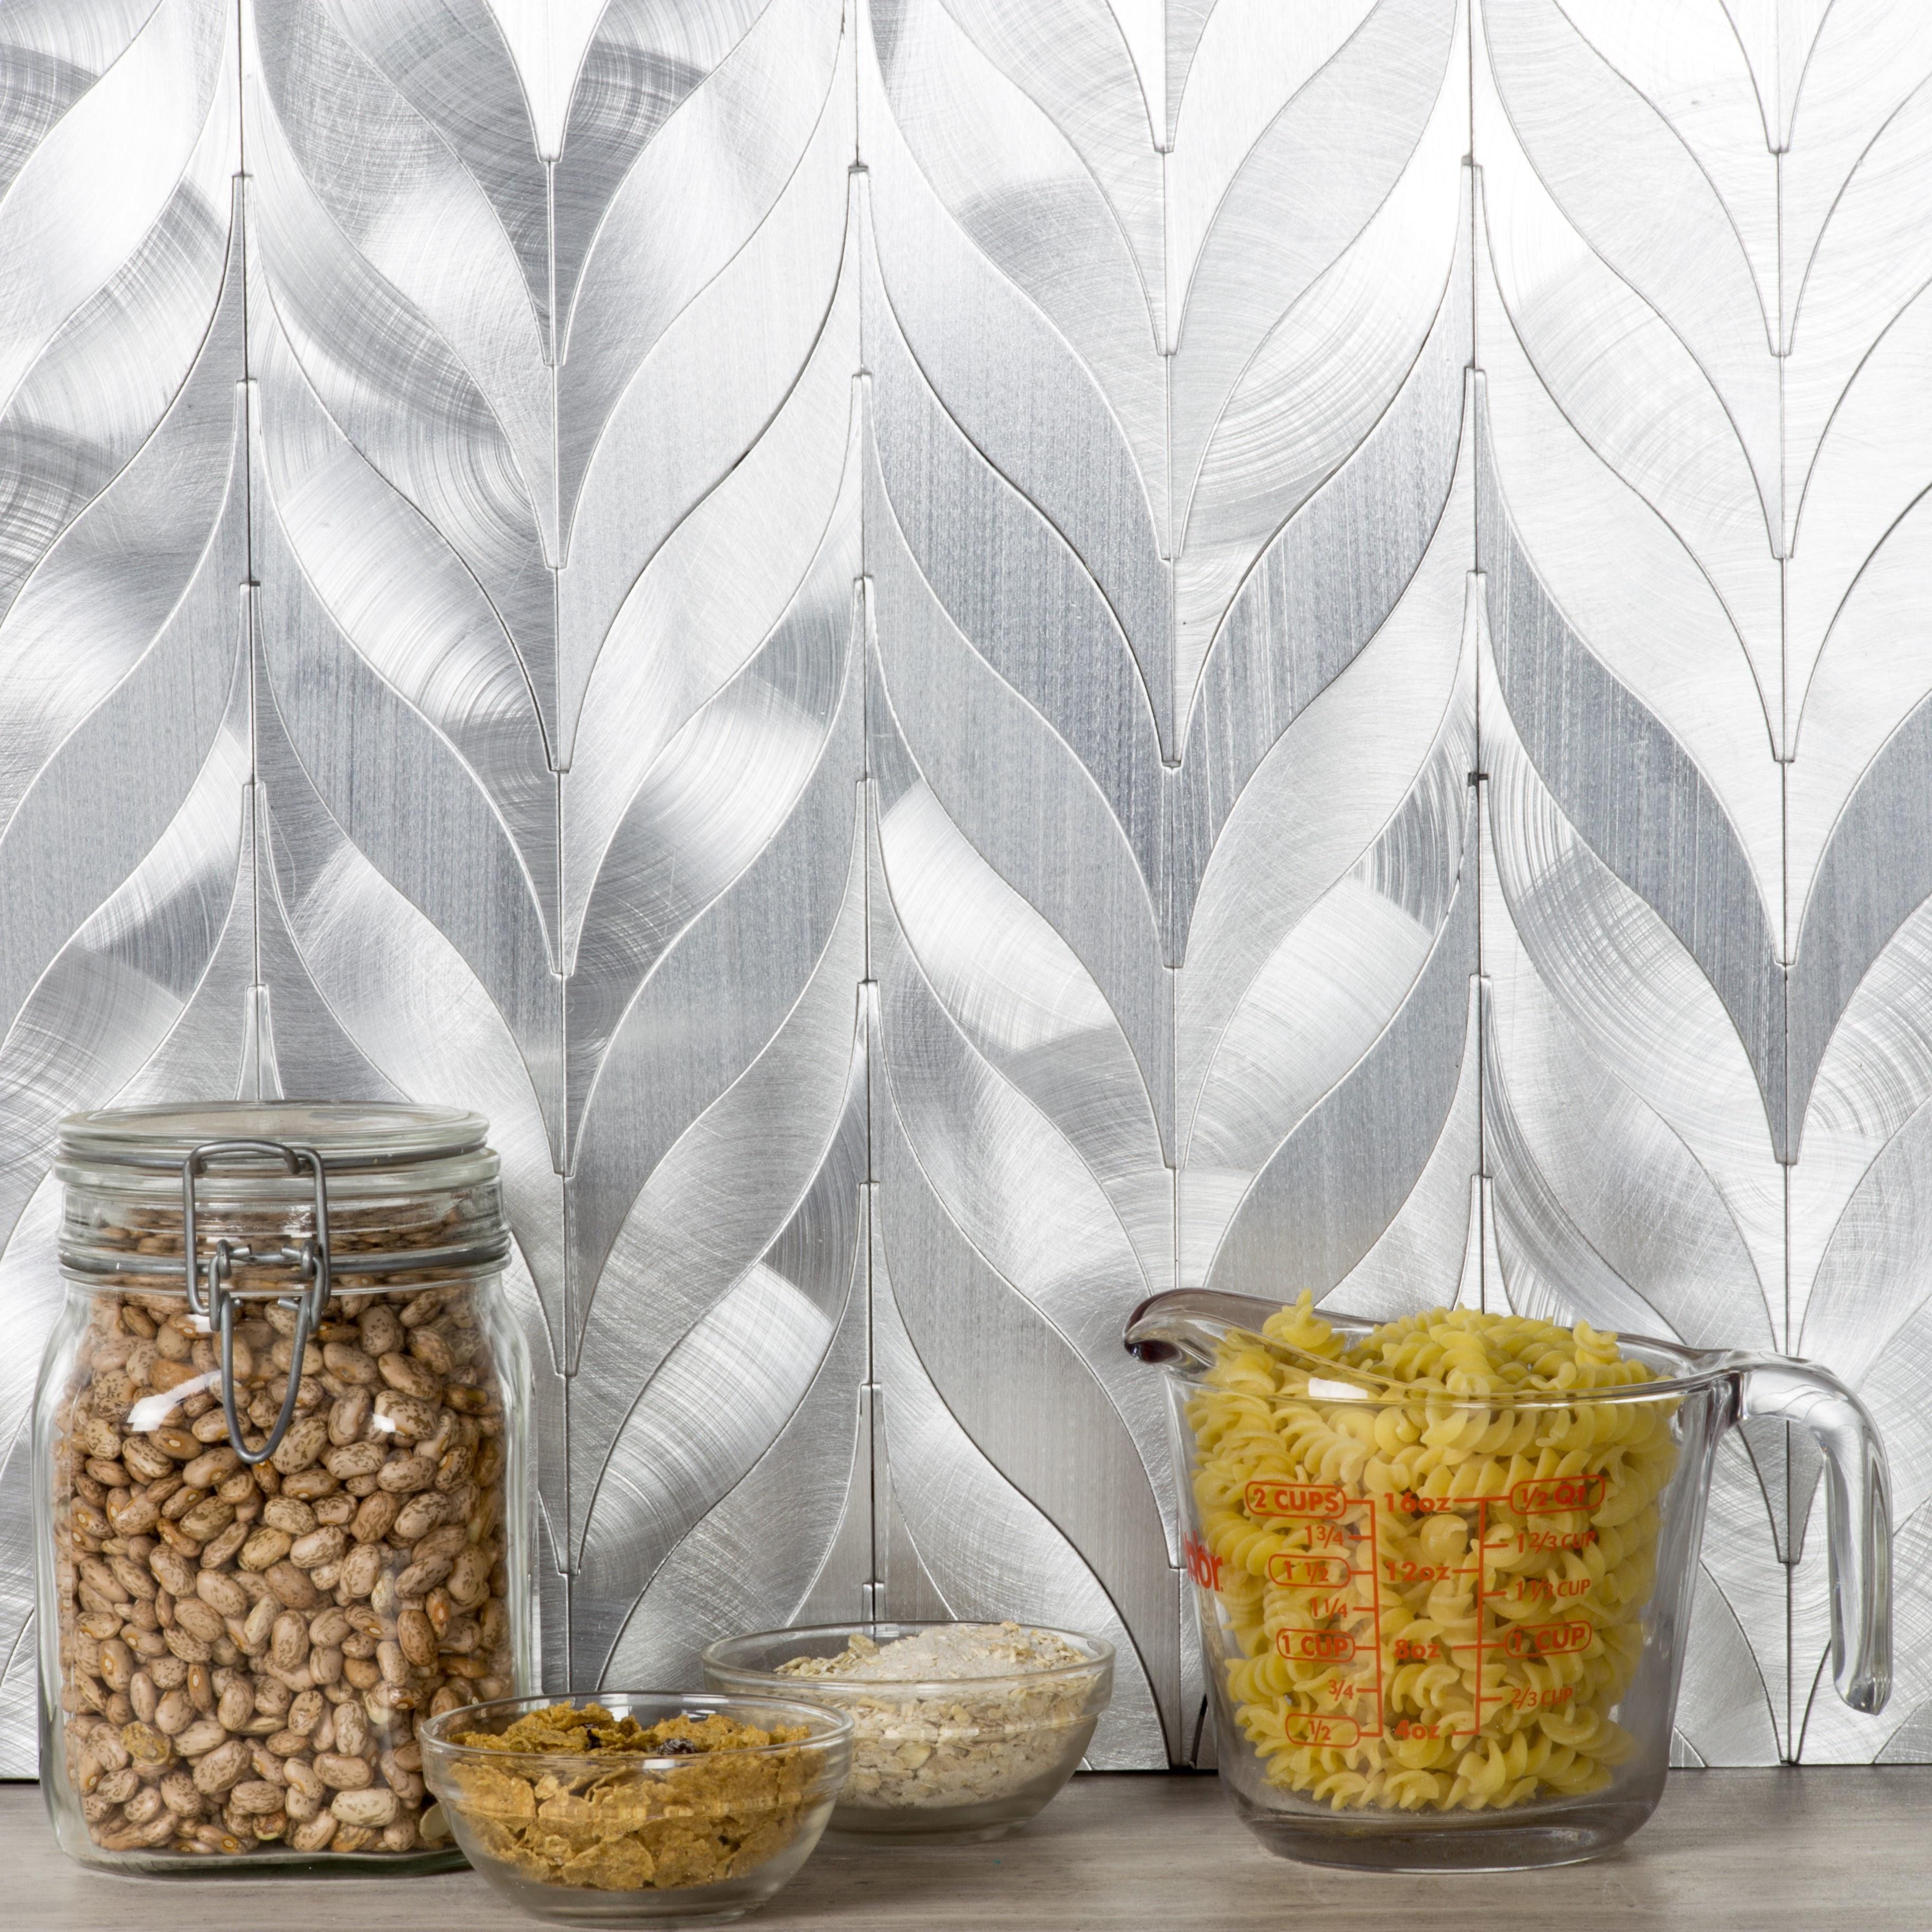 "Enchanted Metals 1.25"" x 7.5"" Brushed Silver Aluminum Mermaid Backsplash Mosaic Wall Tile"